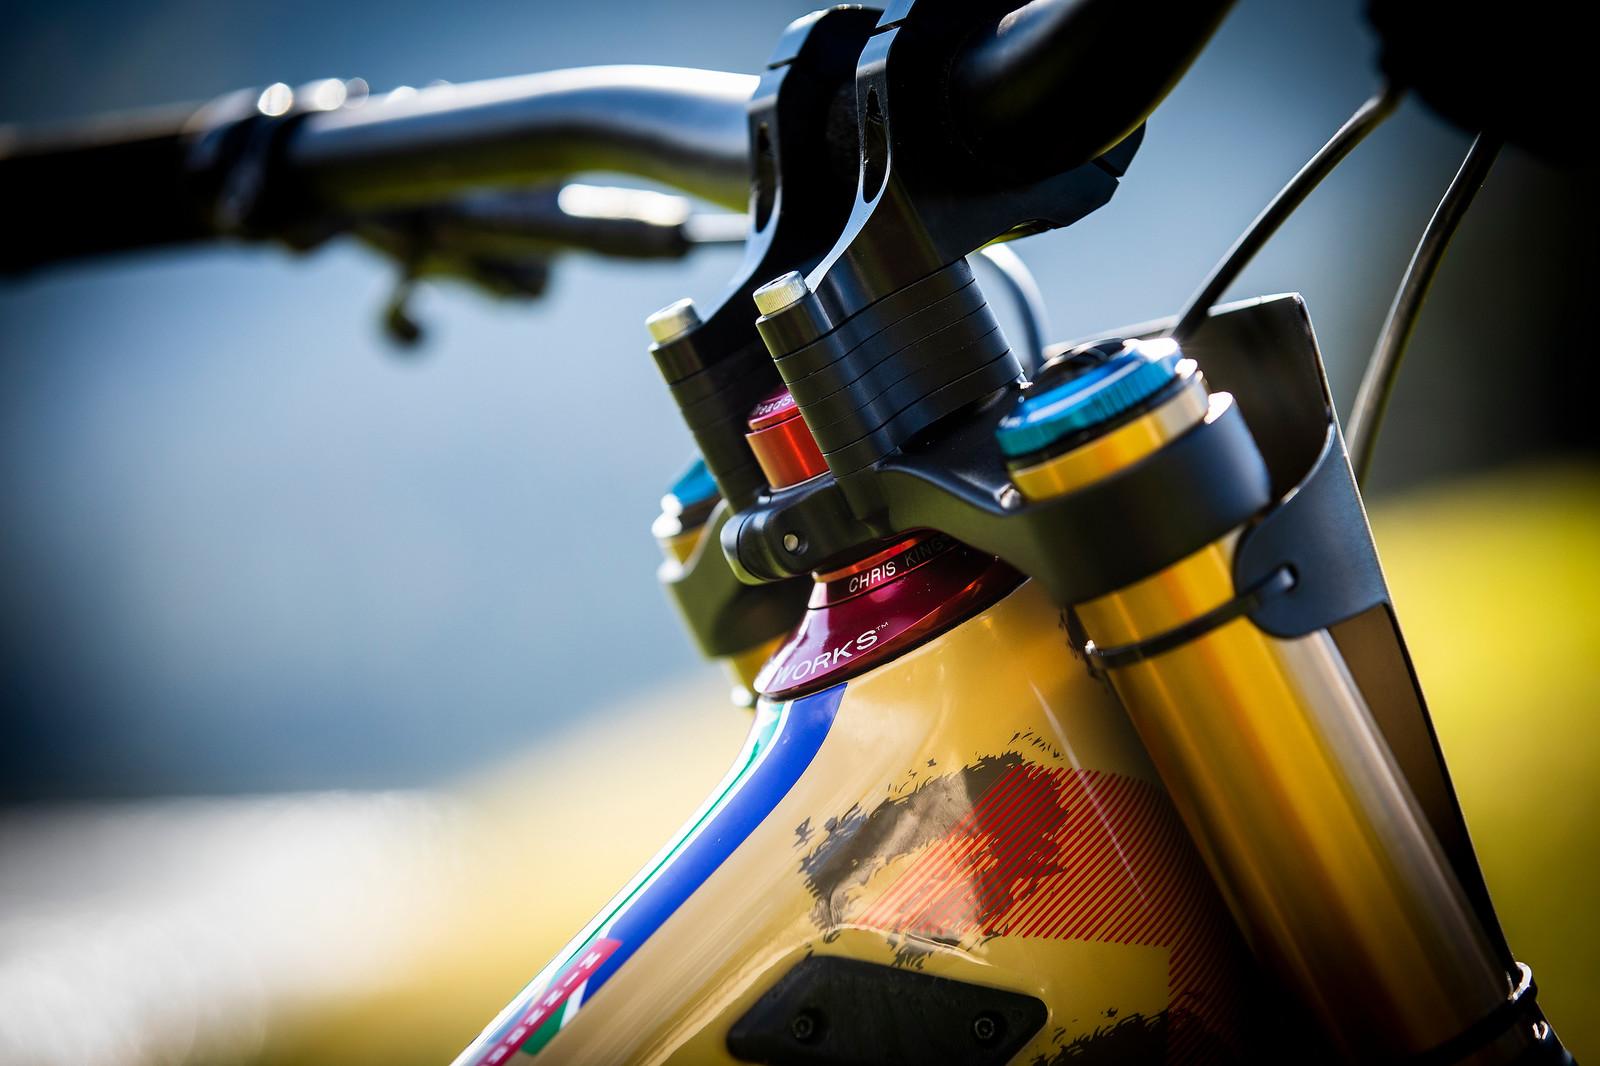 Got Stack? - WORLD CHAMPS BIKE - Greg Minnaar's Santa Cruz V10 - Mountain Biking Pictures - Vital MTB